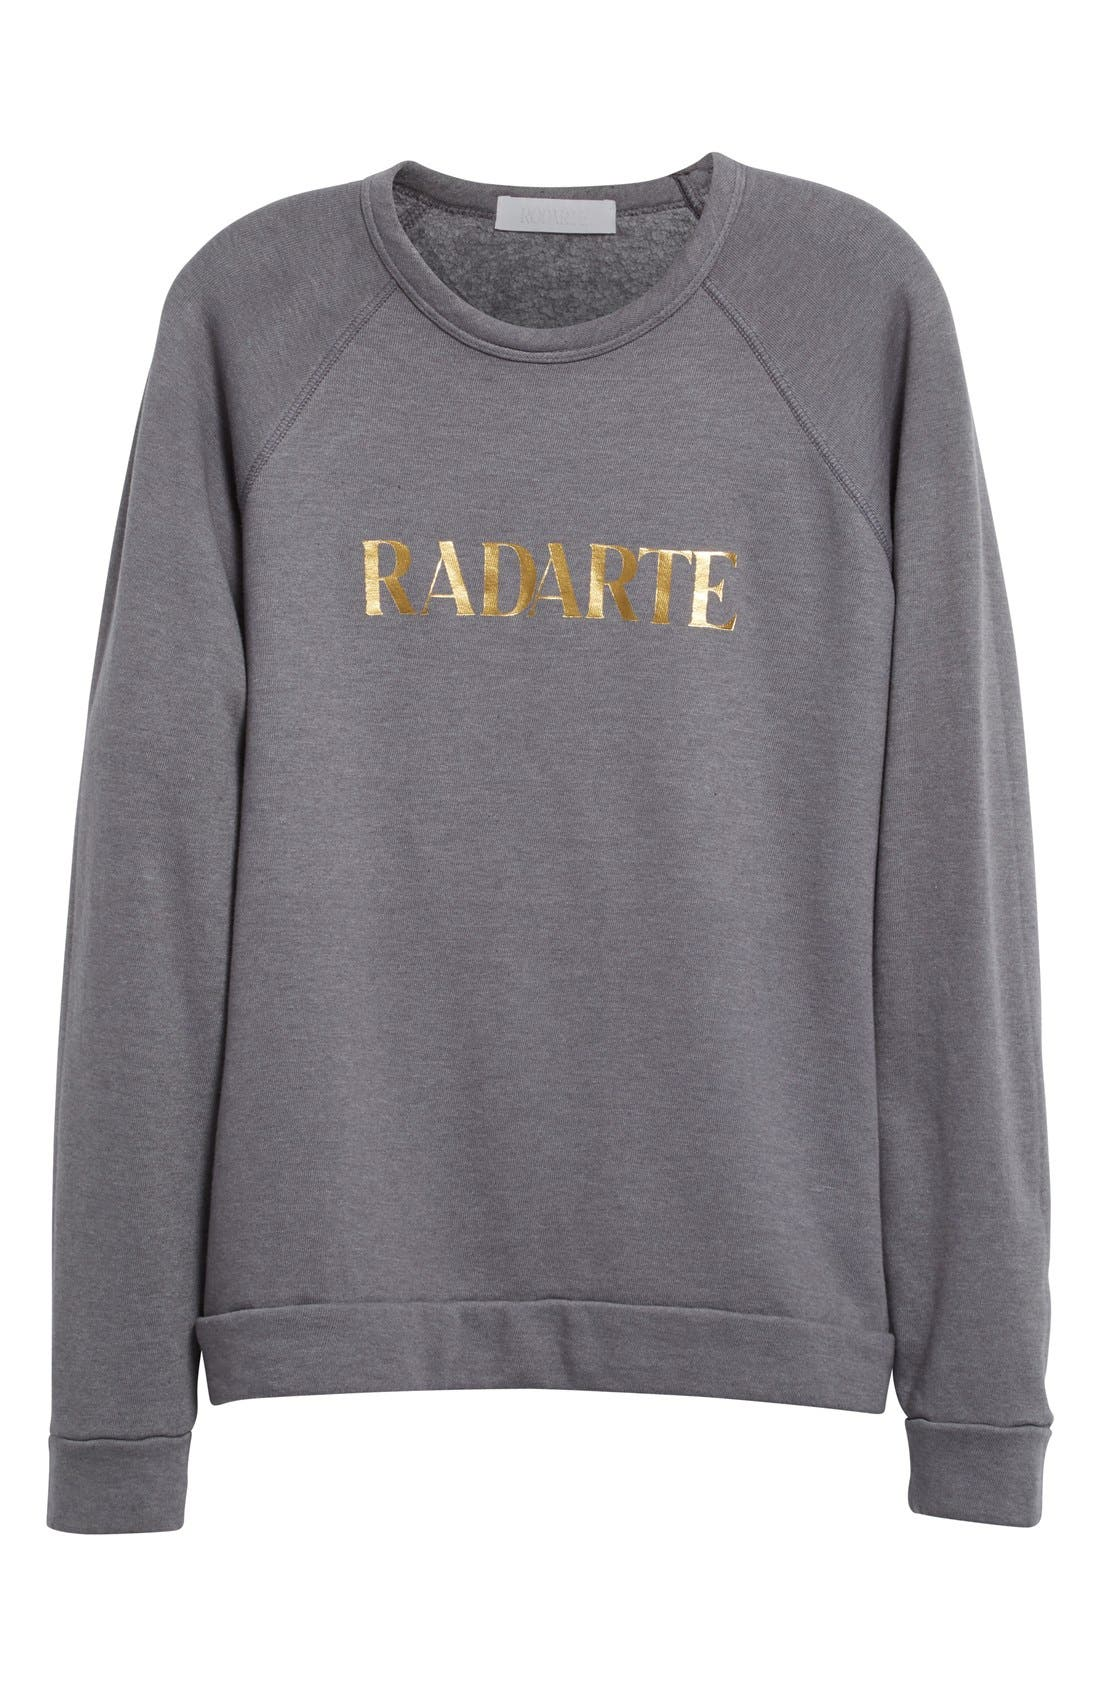 'Radarte' Foil Sweatshirt,                             Alternate thumbnail 5, color,                             022